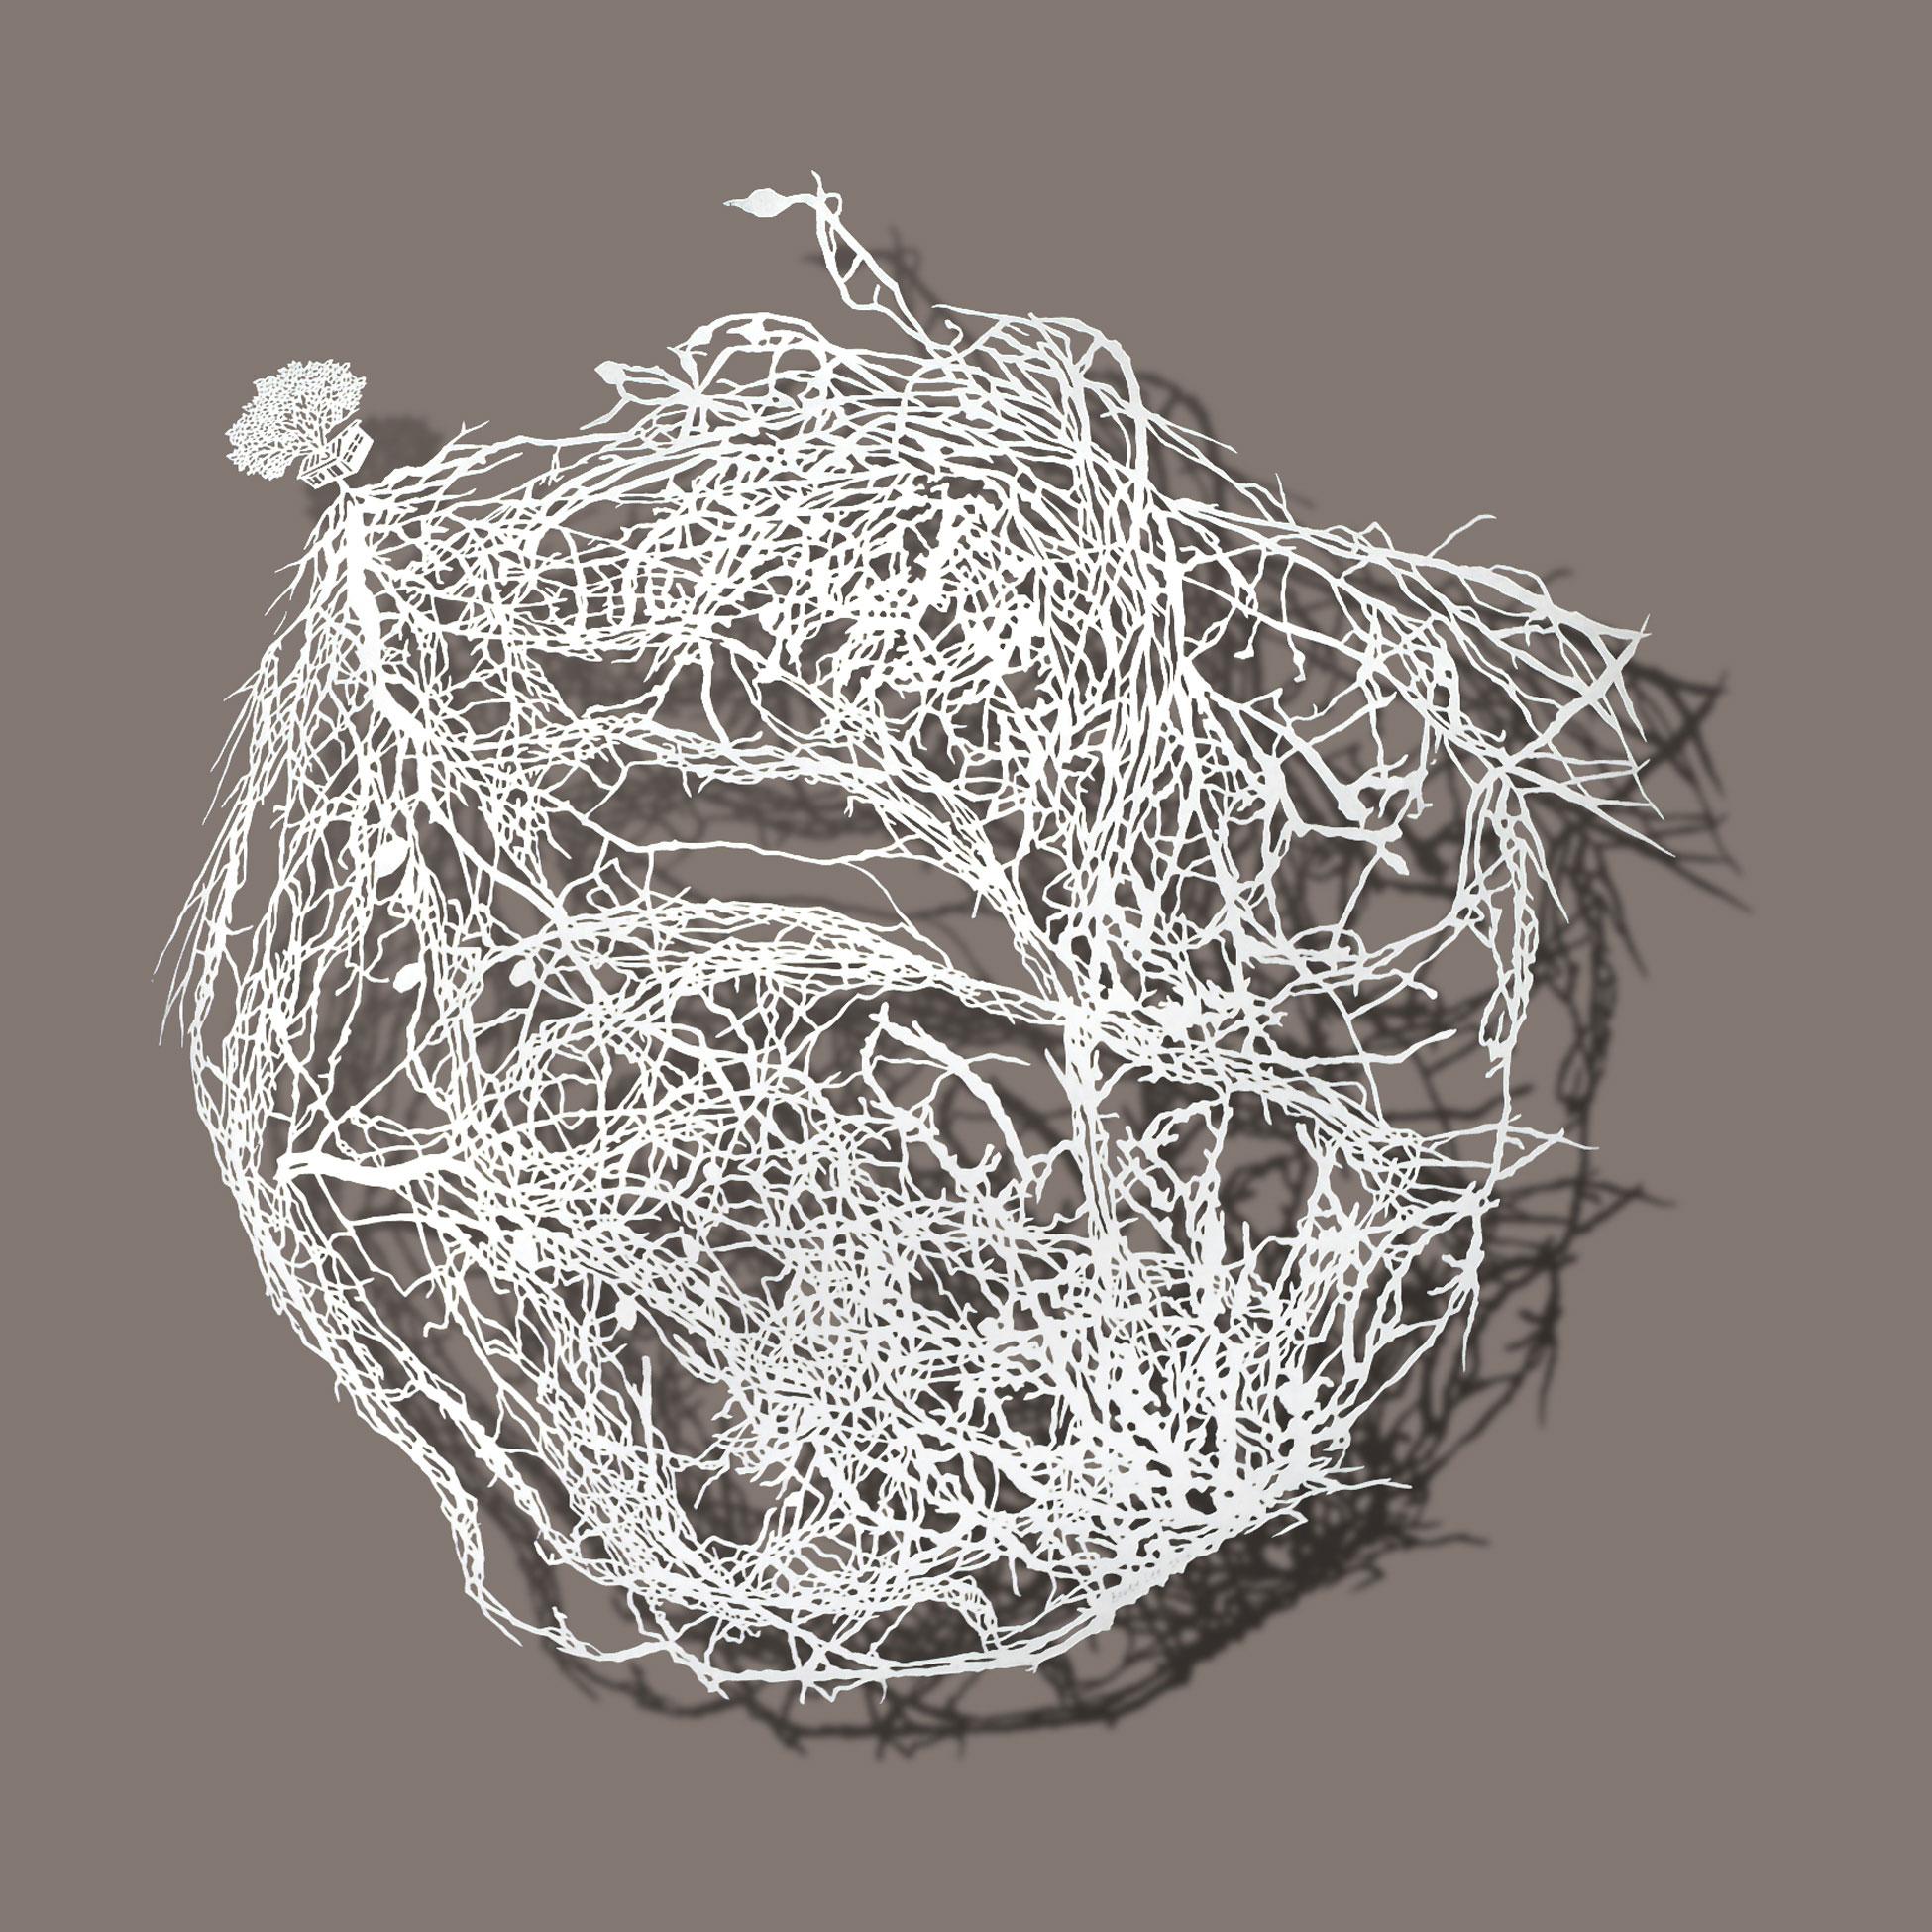 Roots  2014 Cut paper 51 x 51 cm